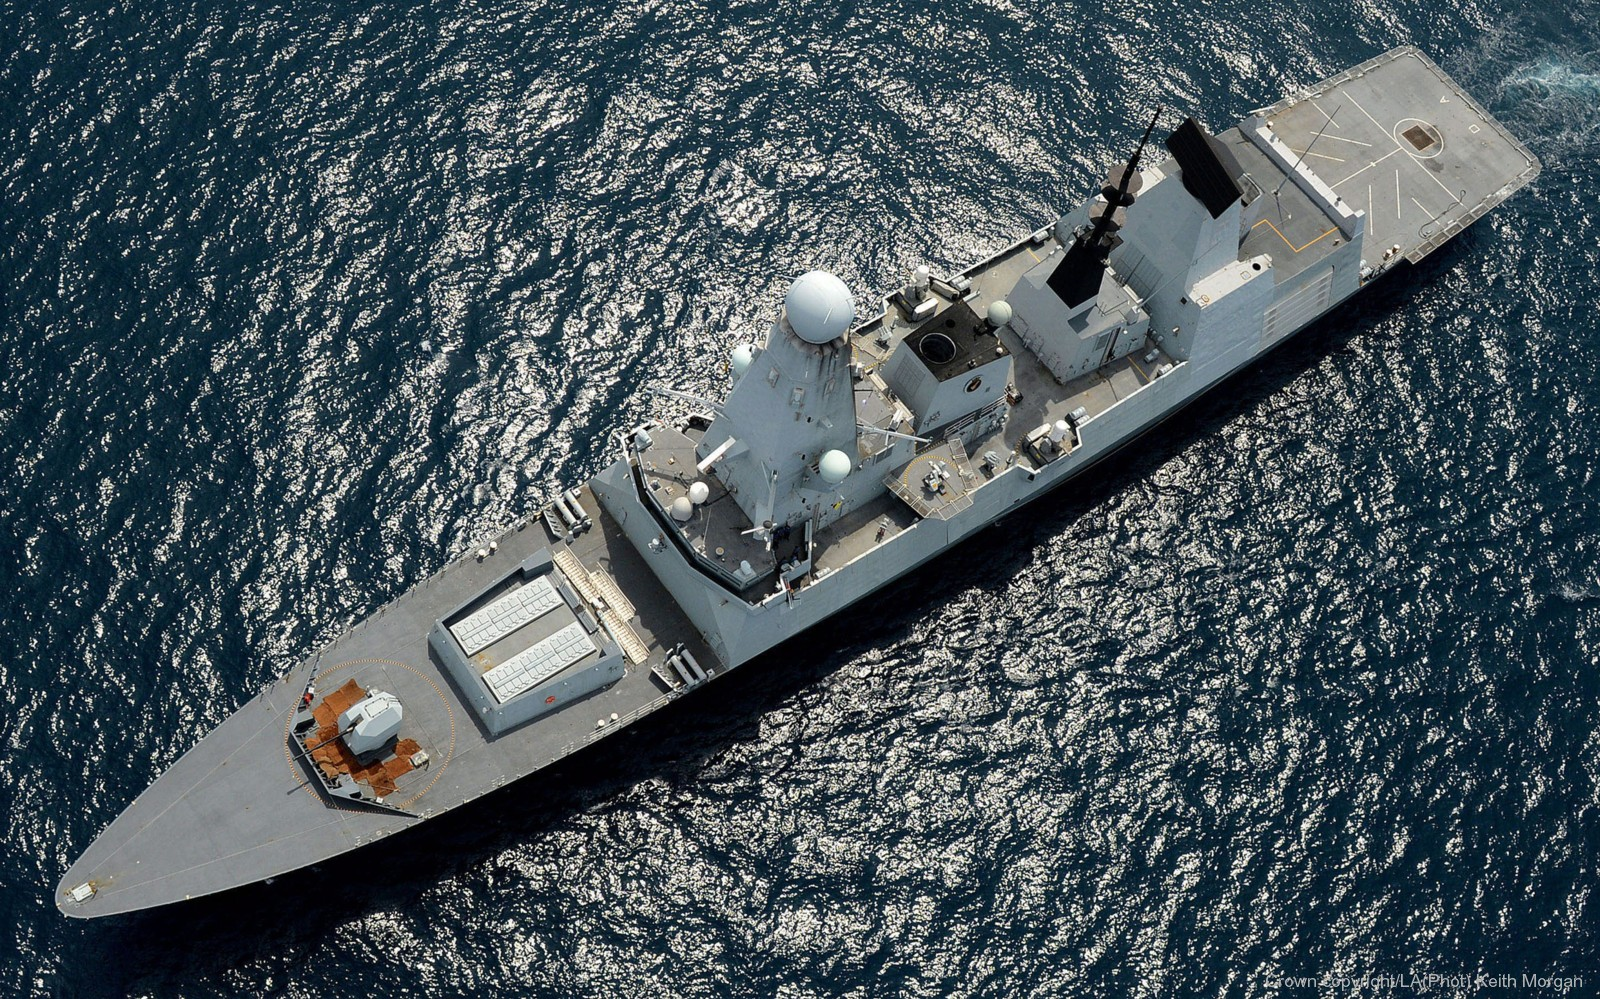 SAOCOM 1A y SAOCOM 1B - Satélites hechos en Argentina - Página 2 D32-HMS-Daring-018